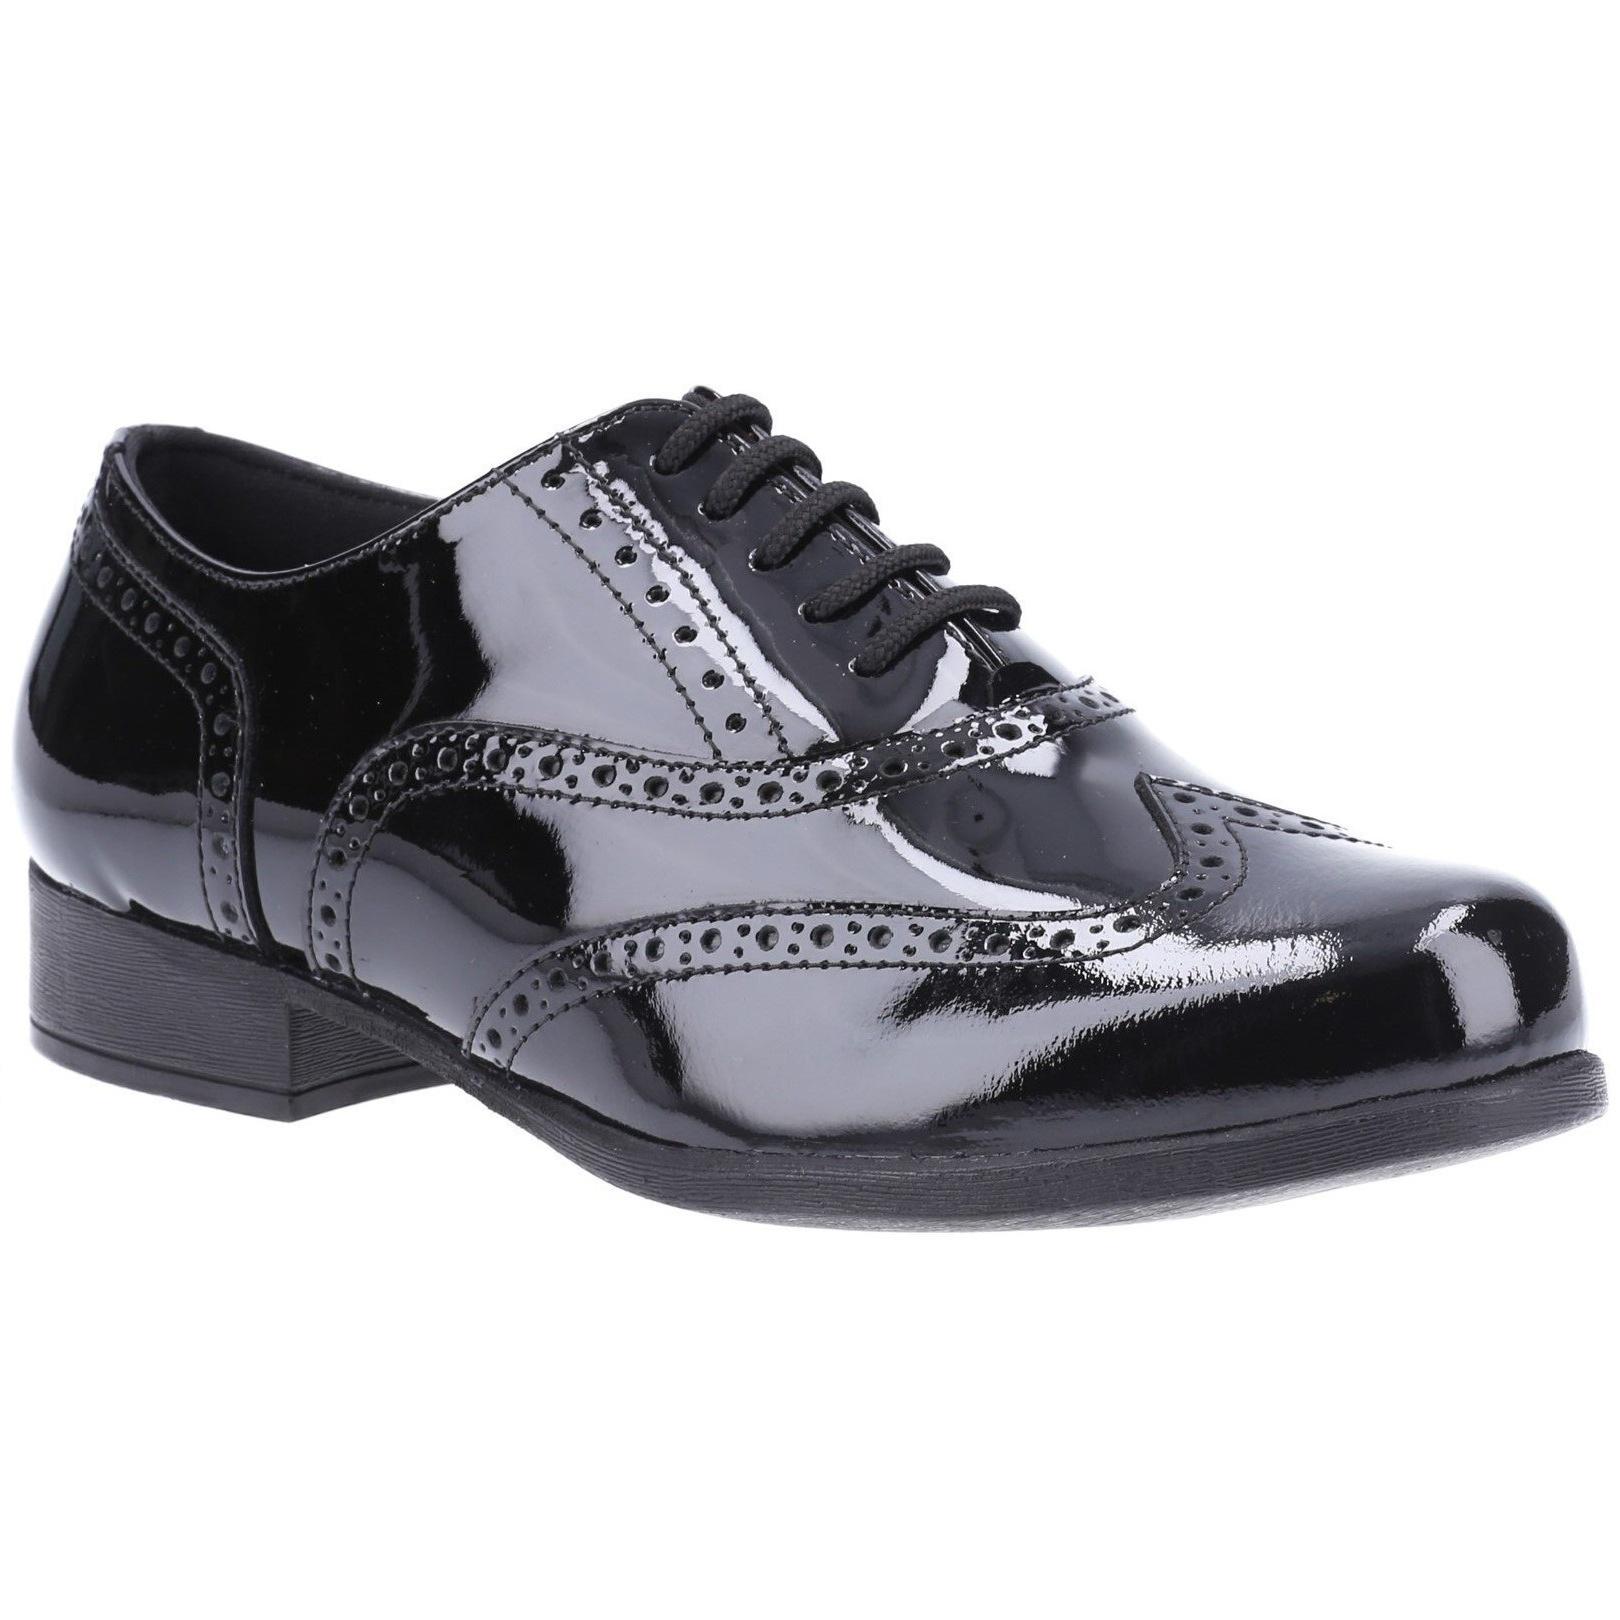 Hush Puppies Girls Kada Patent Leather School Shoes (2 UK) (Black Patent)